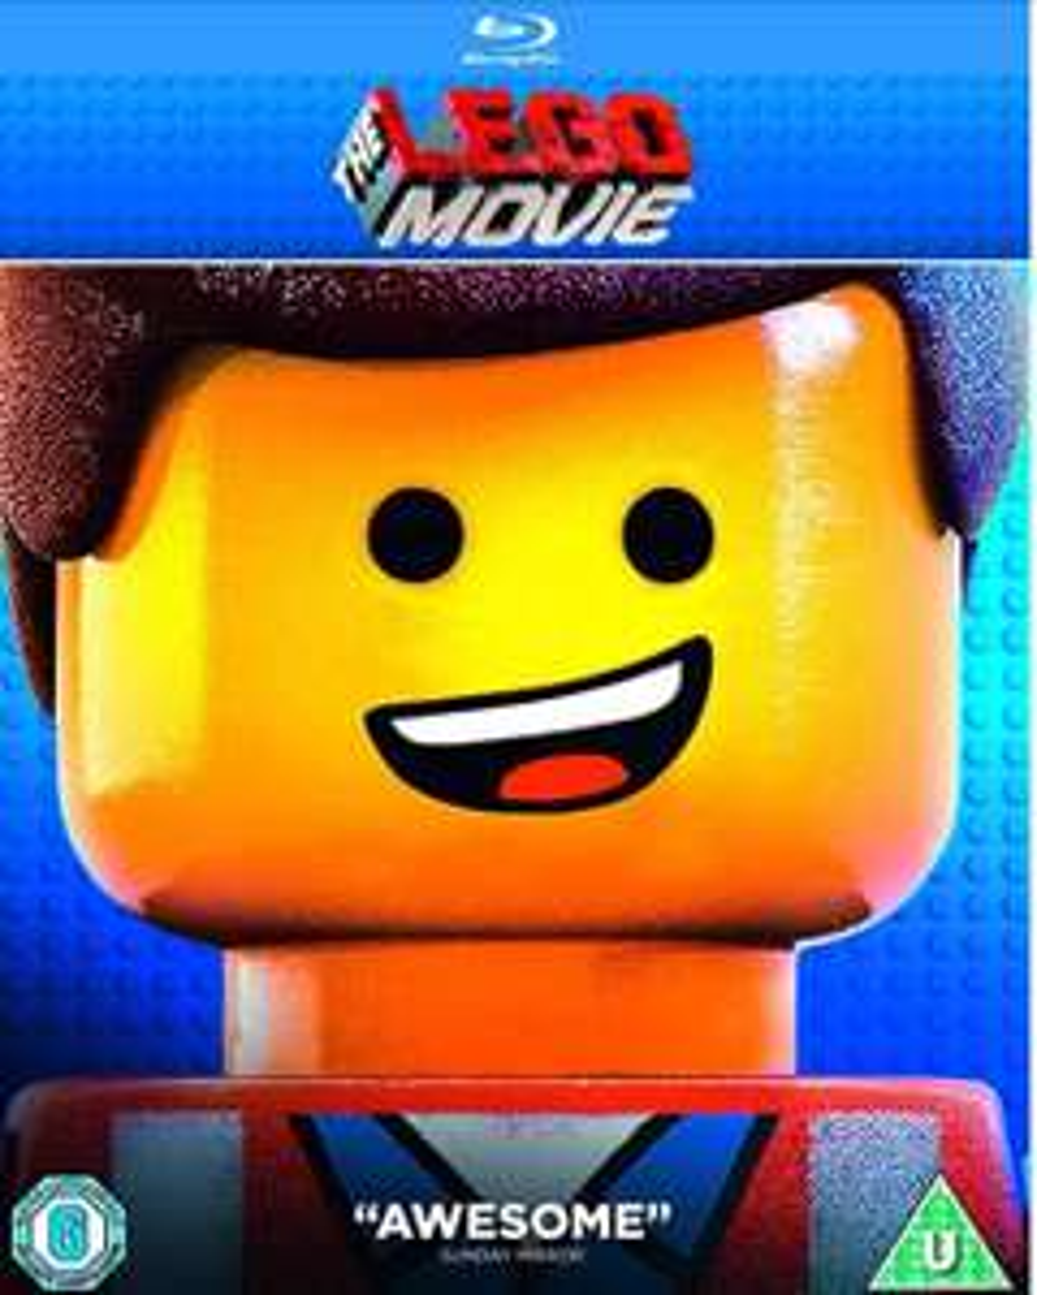 The Lego Movie Blu-ray [2014] [Region Free £2.16 Prime / £5.15 Non Prime @ Amazon